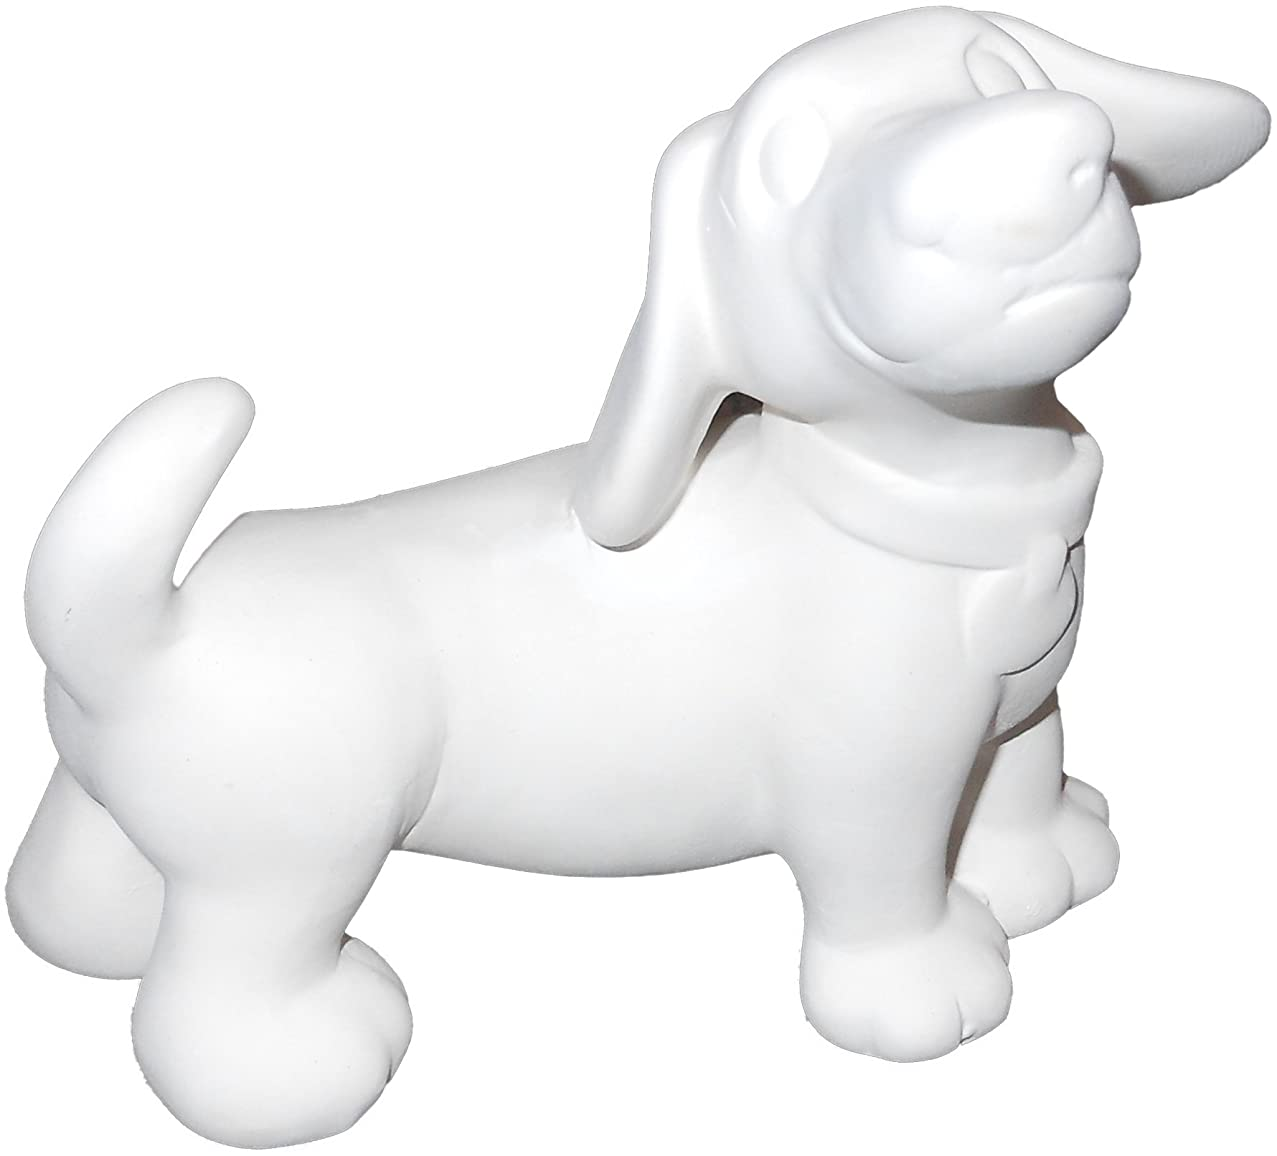 The Lovable Dachshund - Paint Your Own Dog-rific Ceramic Keepsake